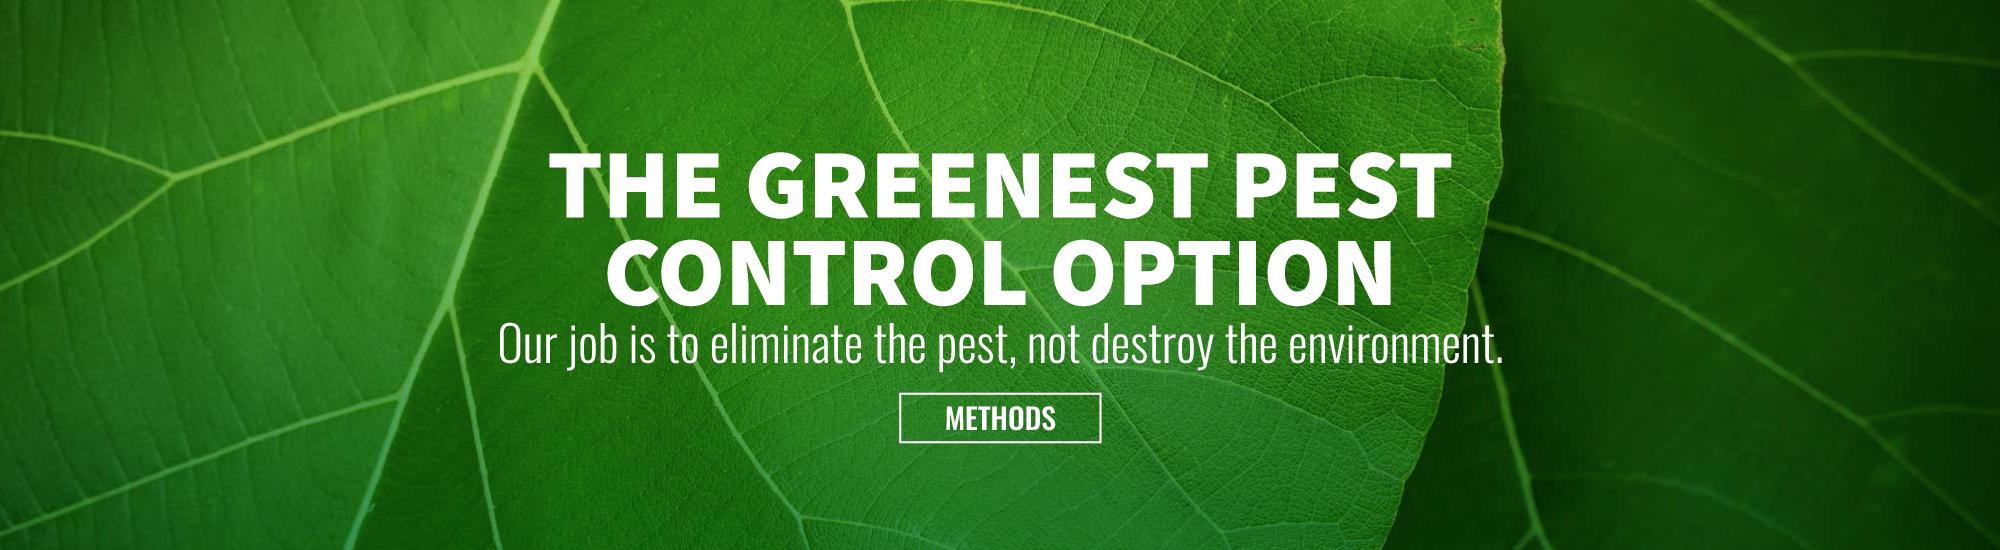 Green Piper Pest Control - Grande Prairie Homepage Banner 2